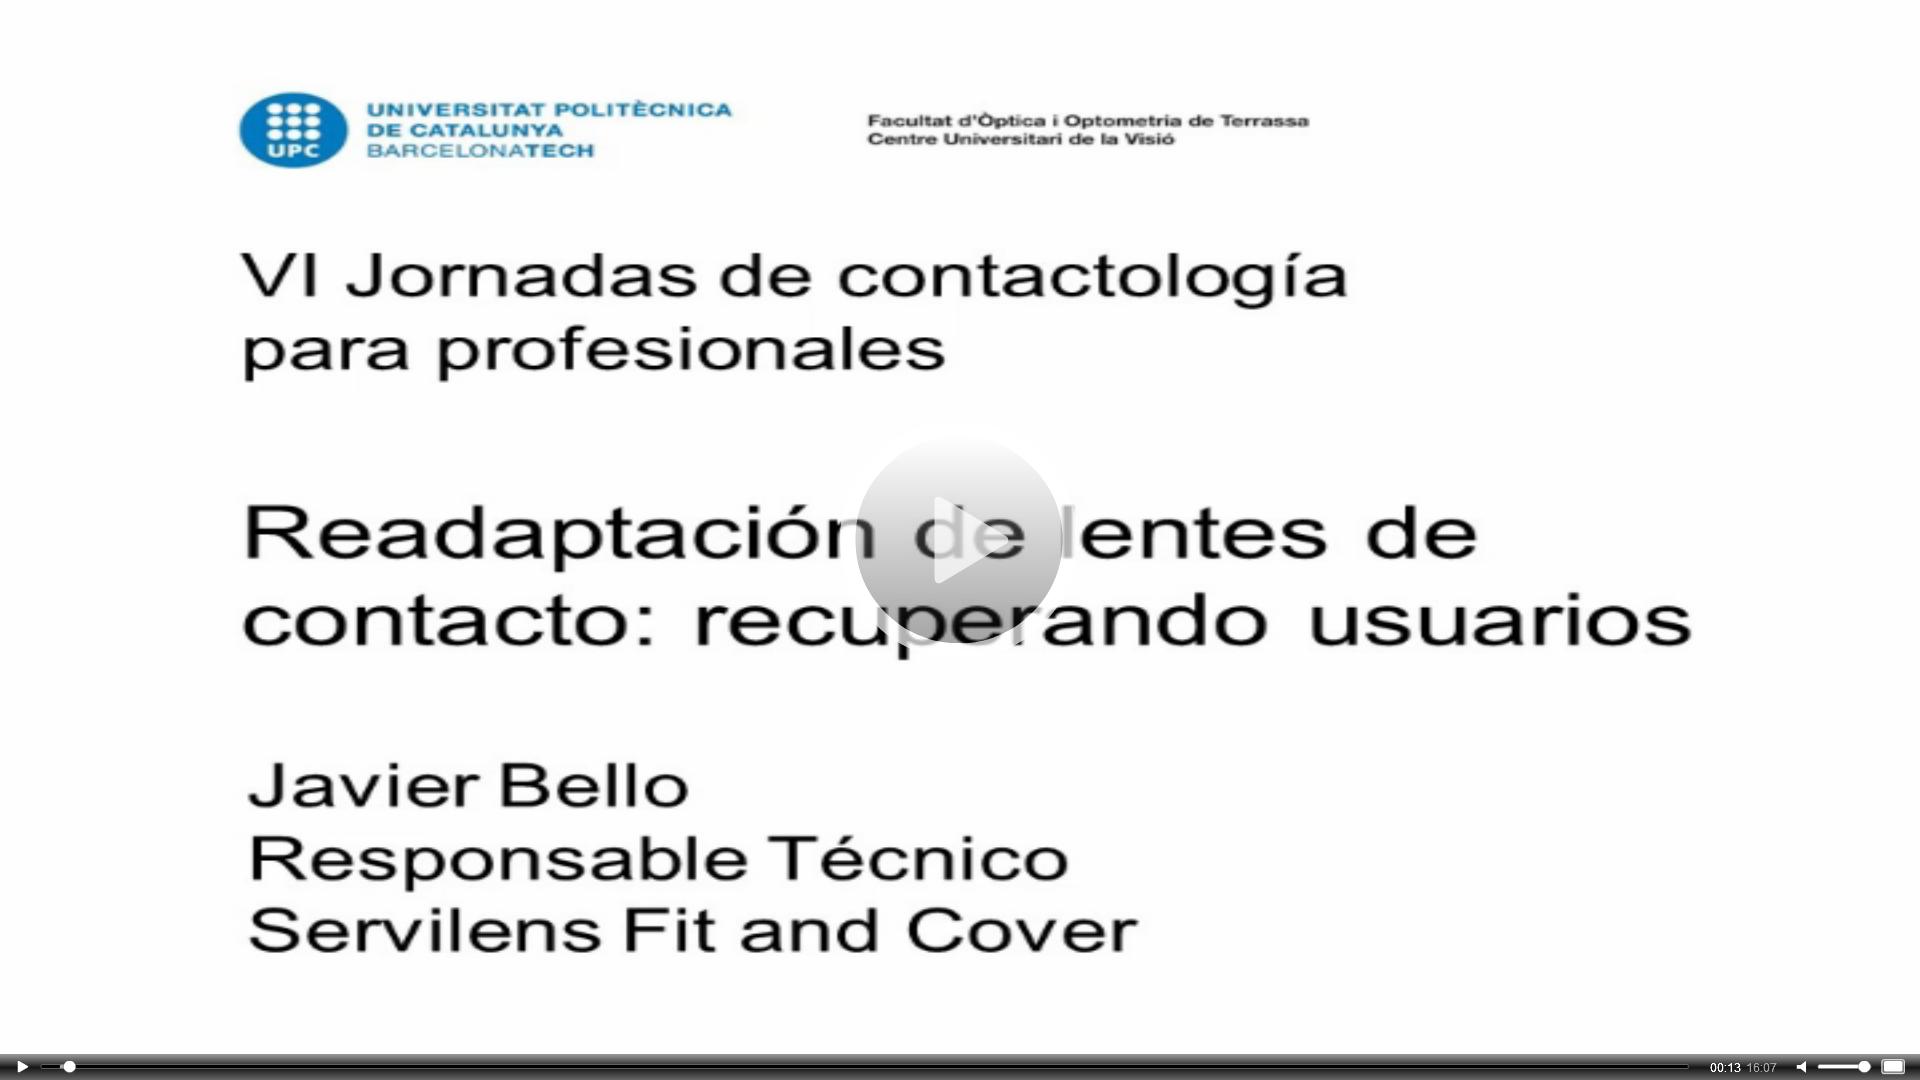 JLC2015_readaptacion_recuperacion_usuarios(Javier_Bello-Servilens)